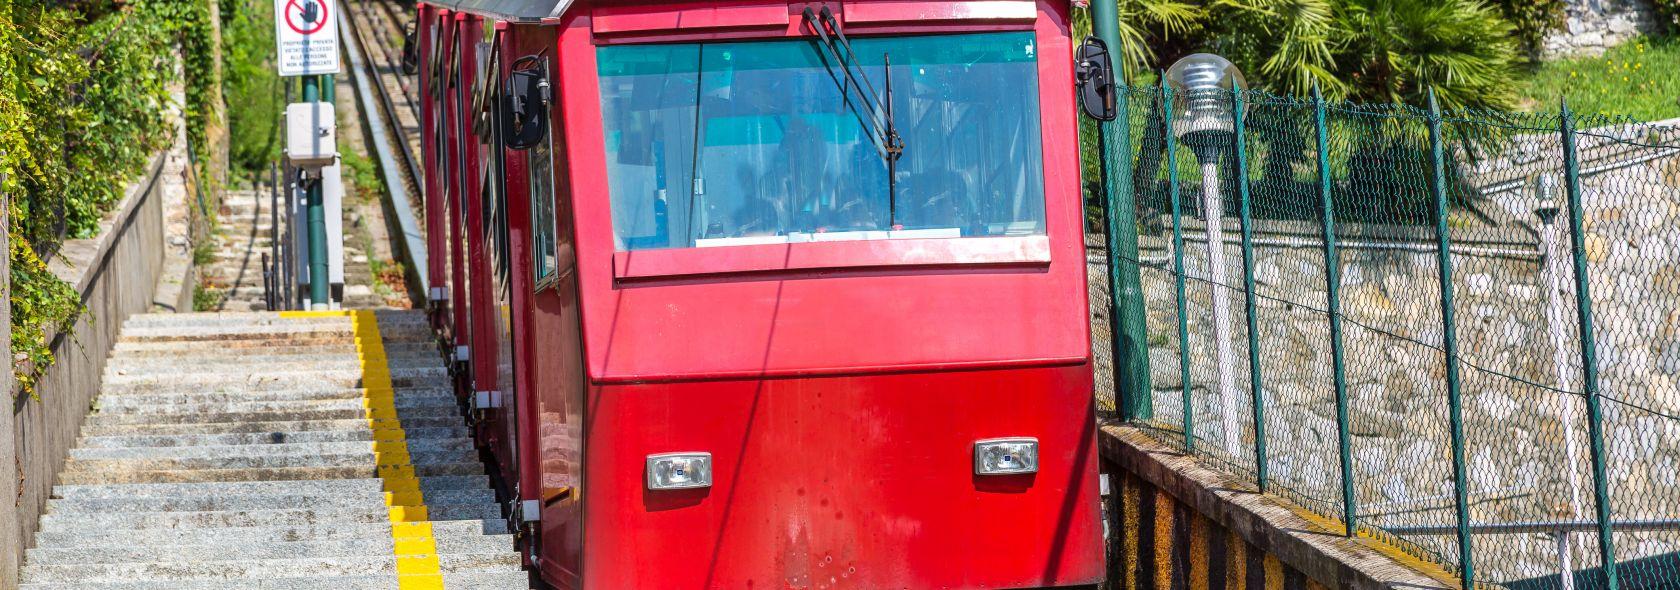 Seilbahn und Zahnradbahn